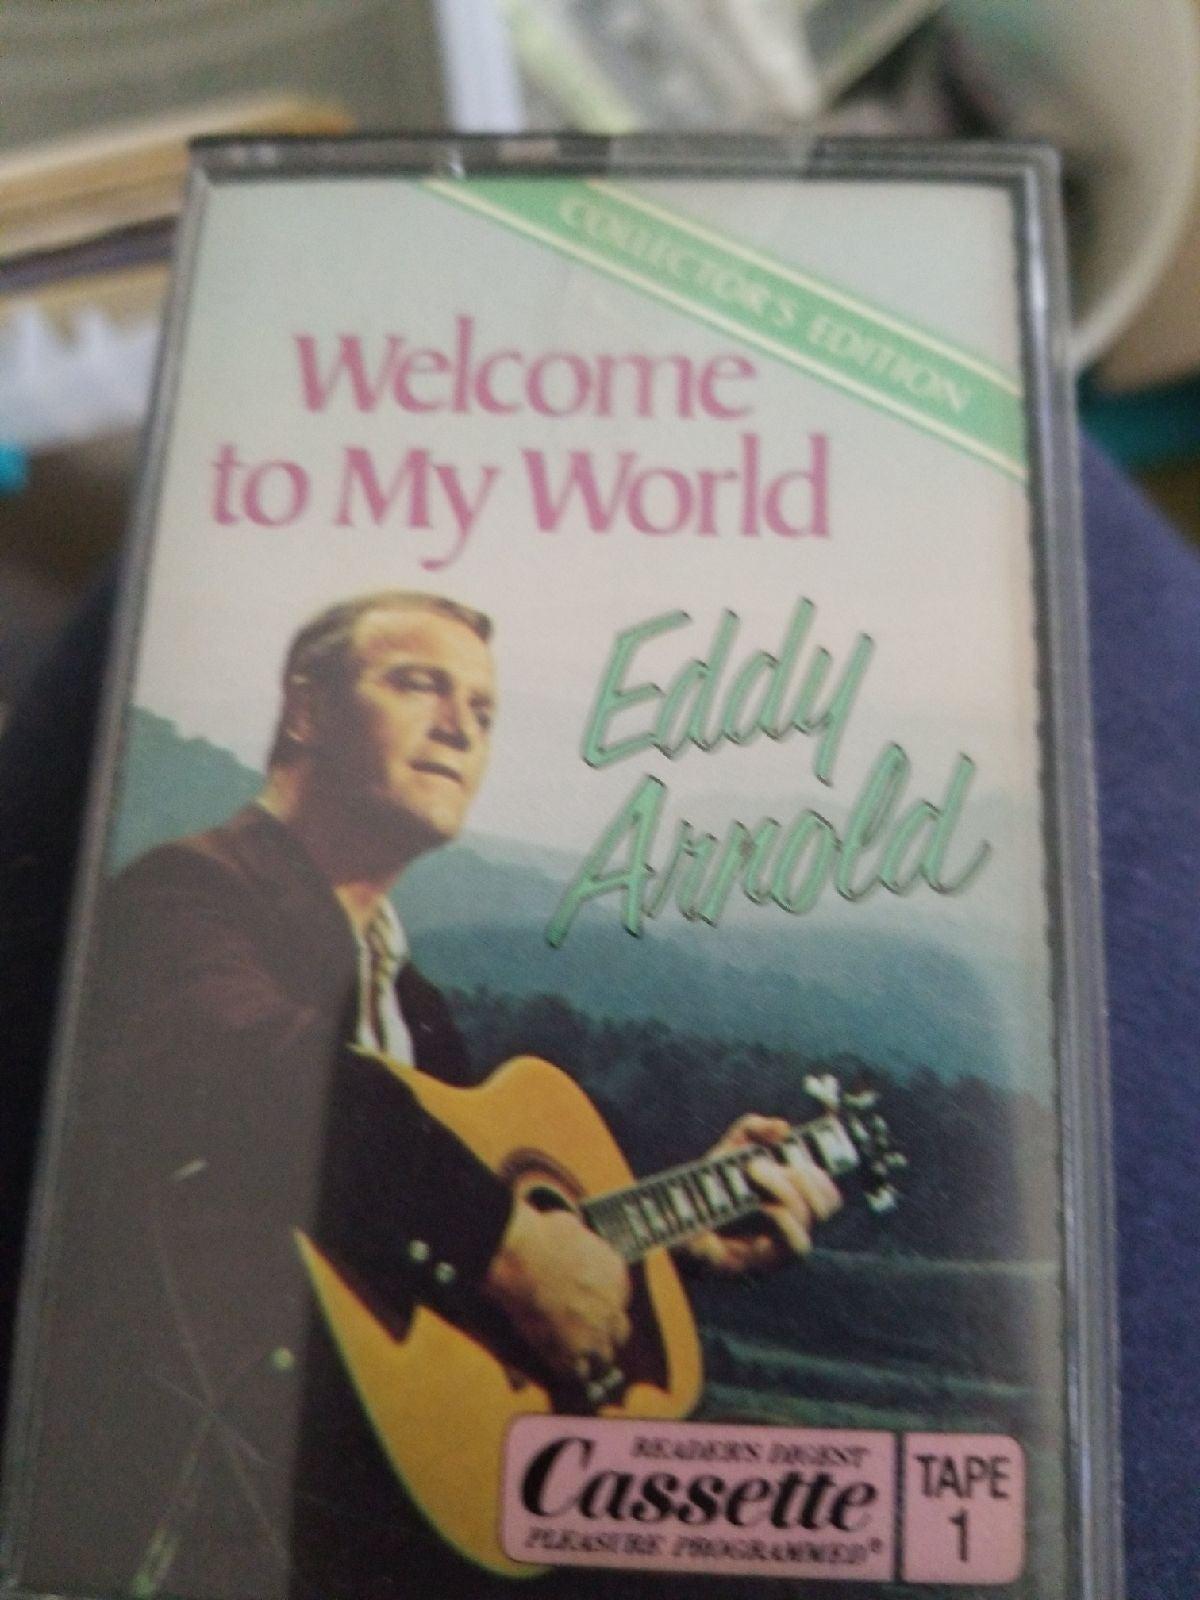 Eddy Arnold Cassettes